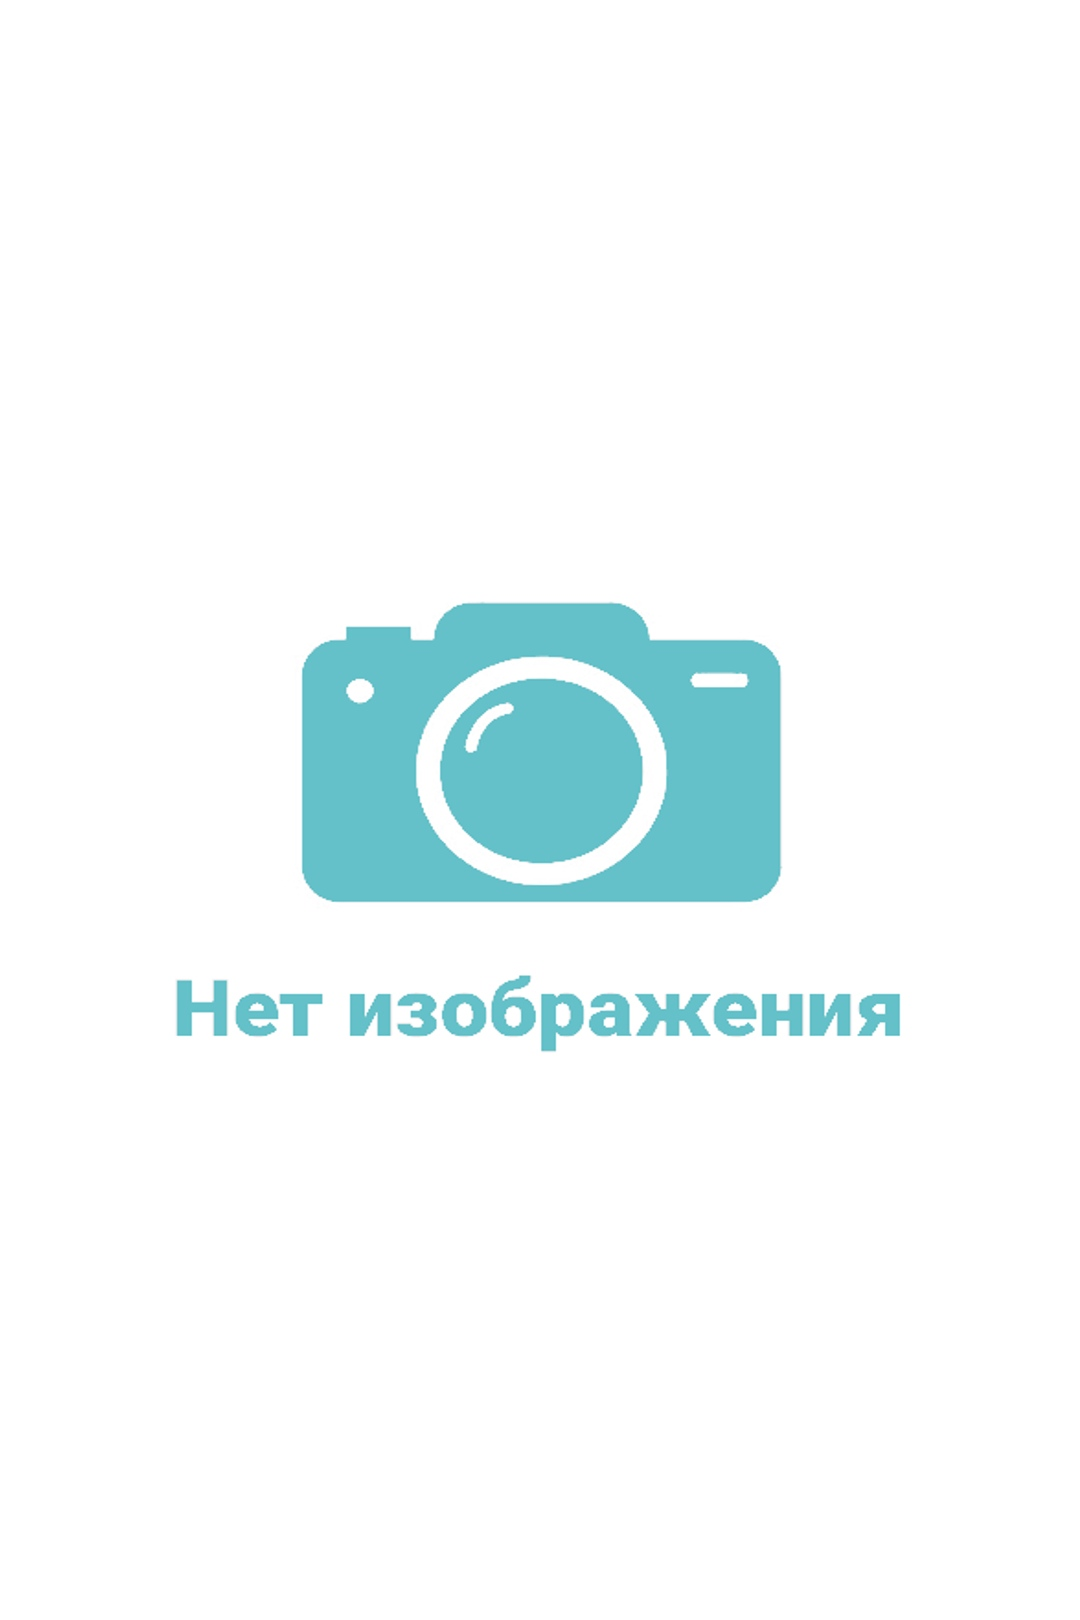 Врач хирург Несов Геннадий Владимирович